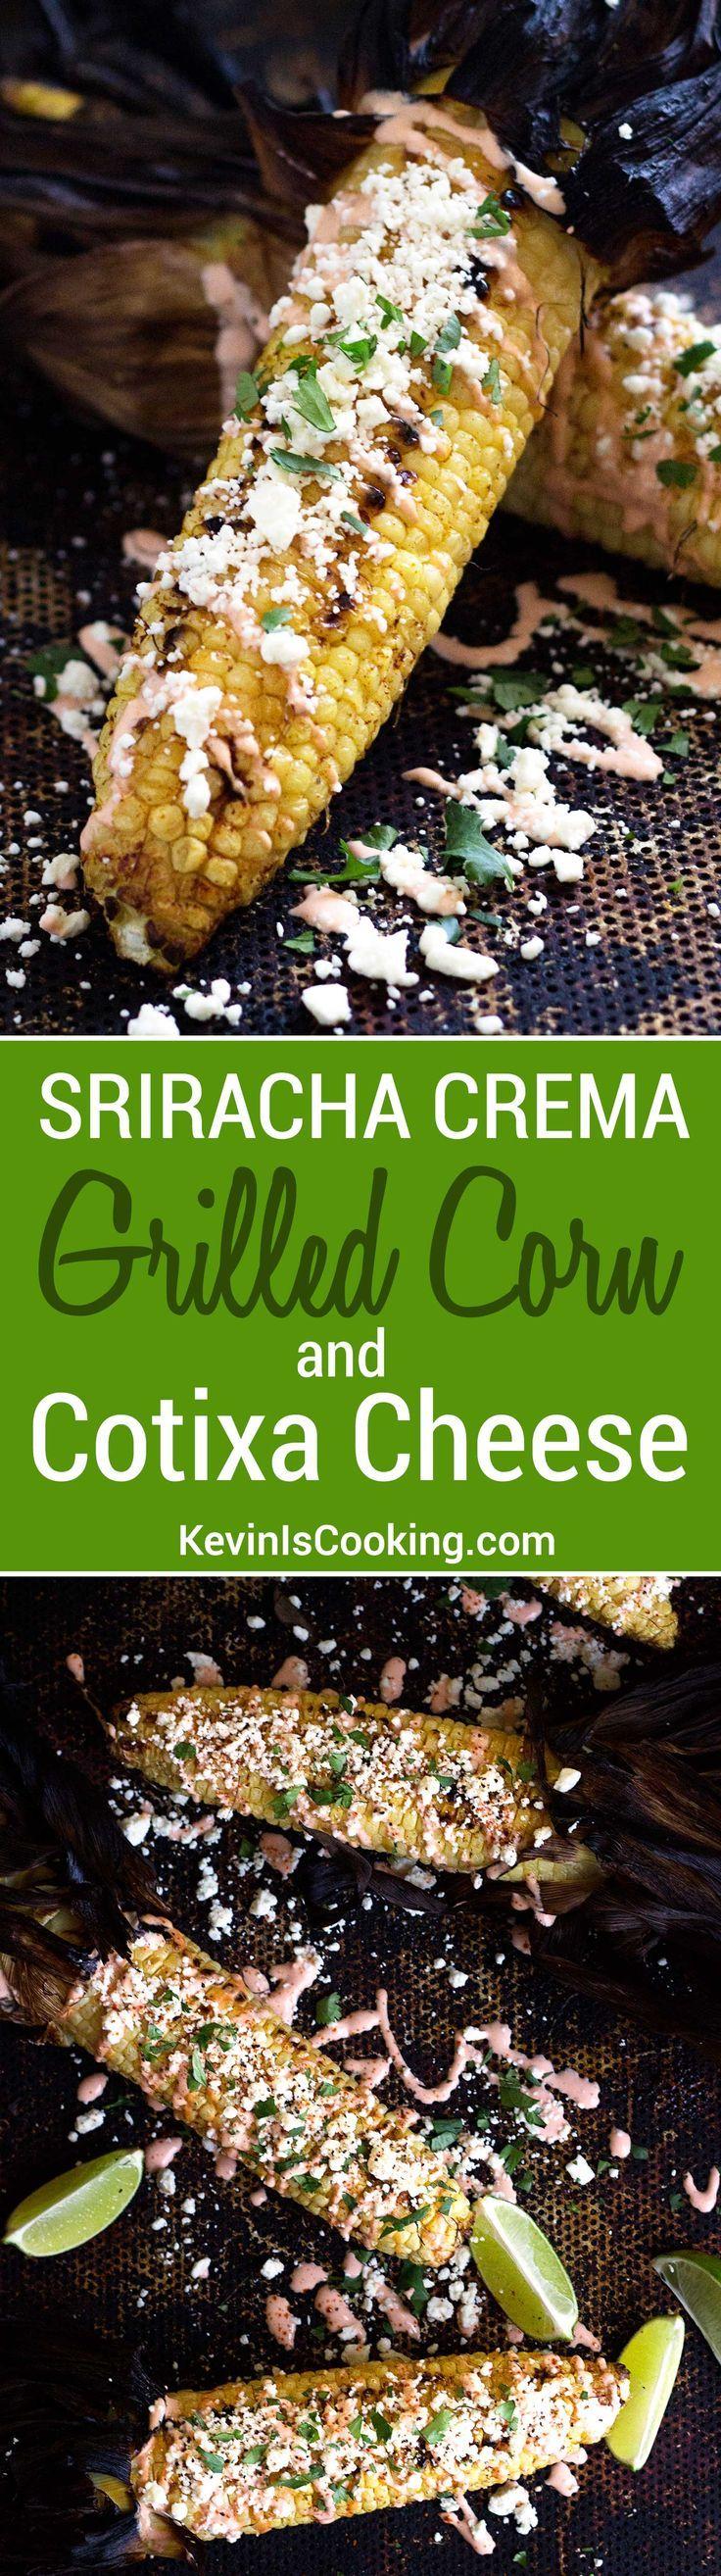 43 best corn on the cob images on pinterest grilled veggies corn